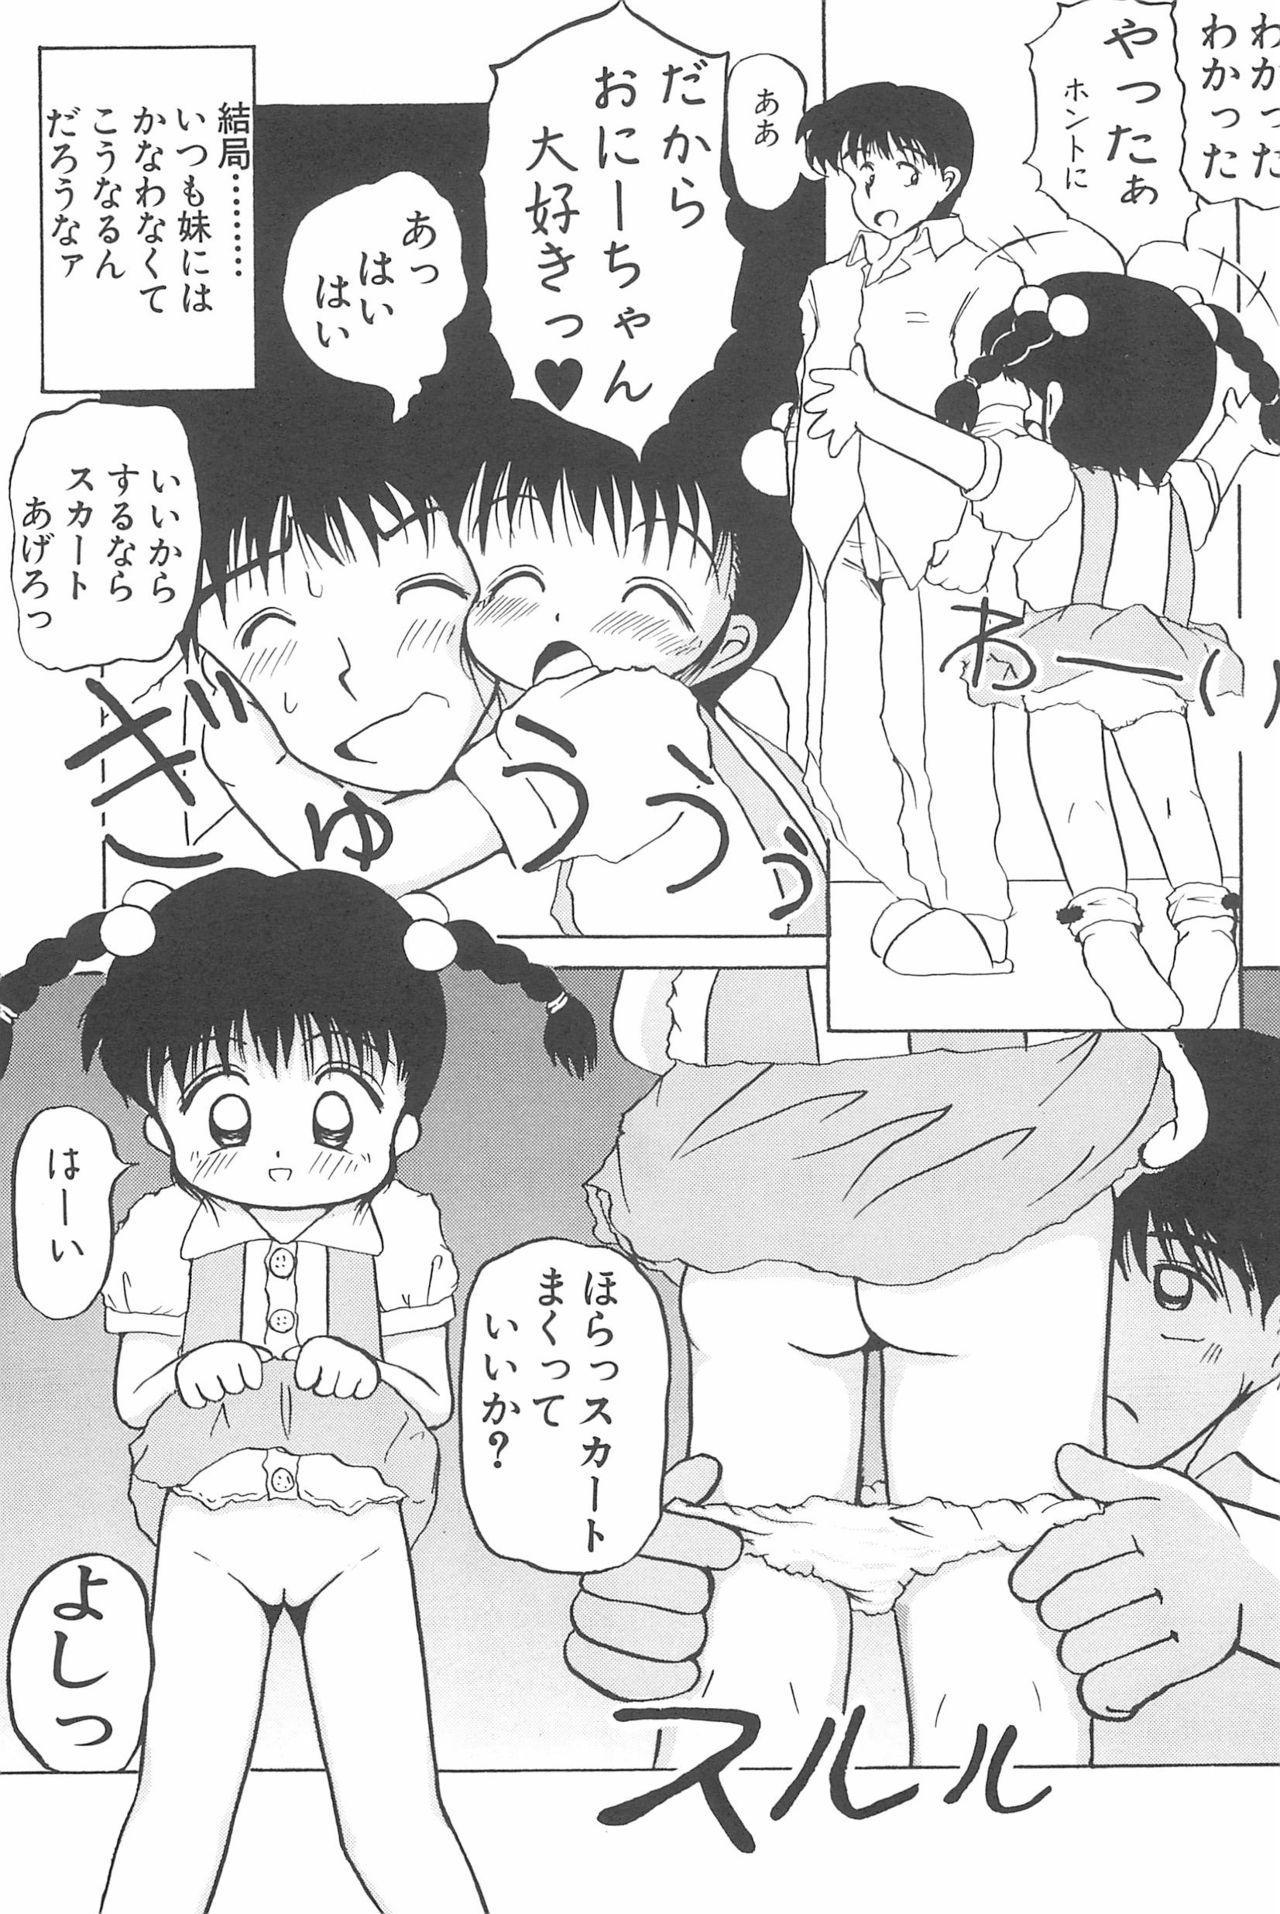 Aoi Shojokyuu 144